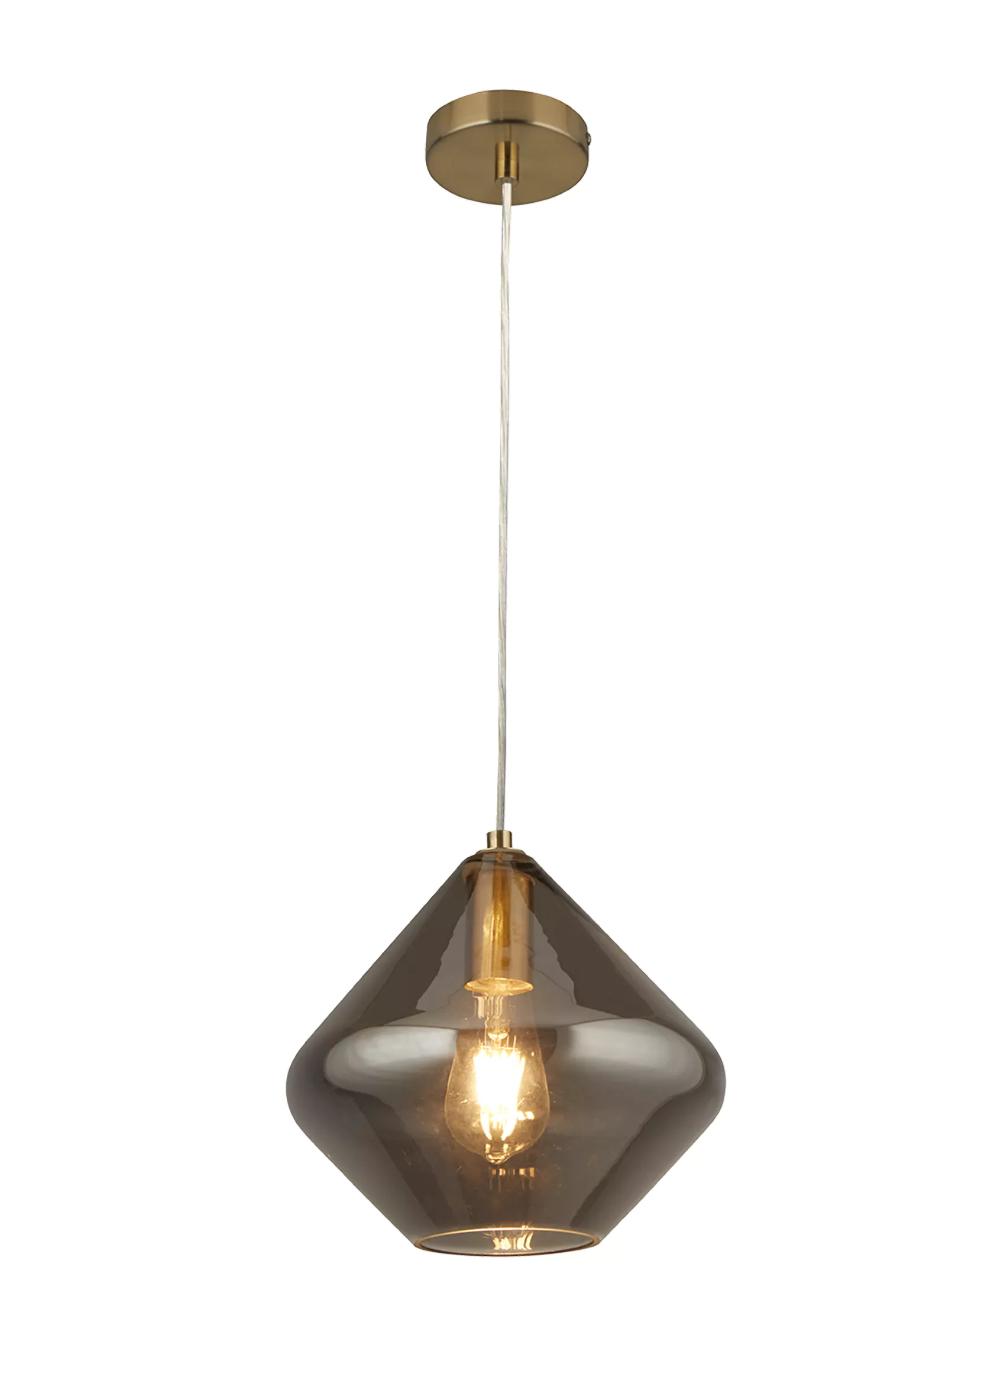 Edie Smoked Glass Pendant Drop Light H120cm X W25cm Grey Drop Pendant Lights Drop Ceiling Lighting Clear Glass Pendant Light